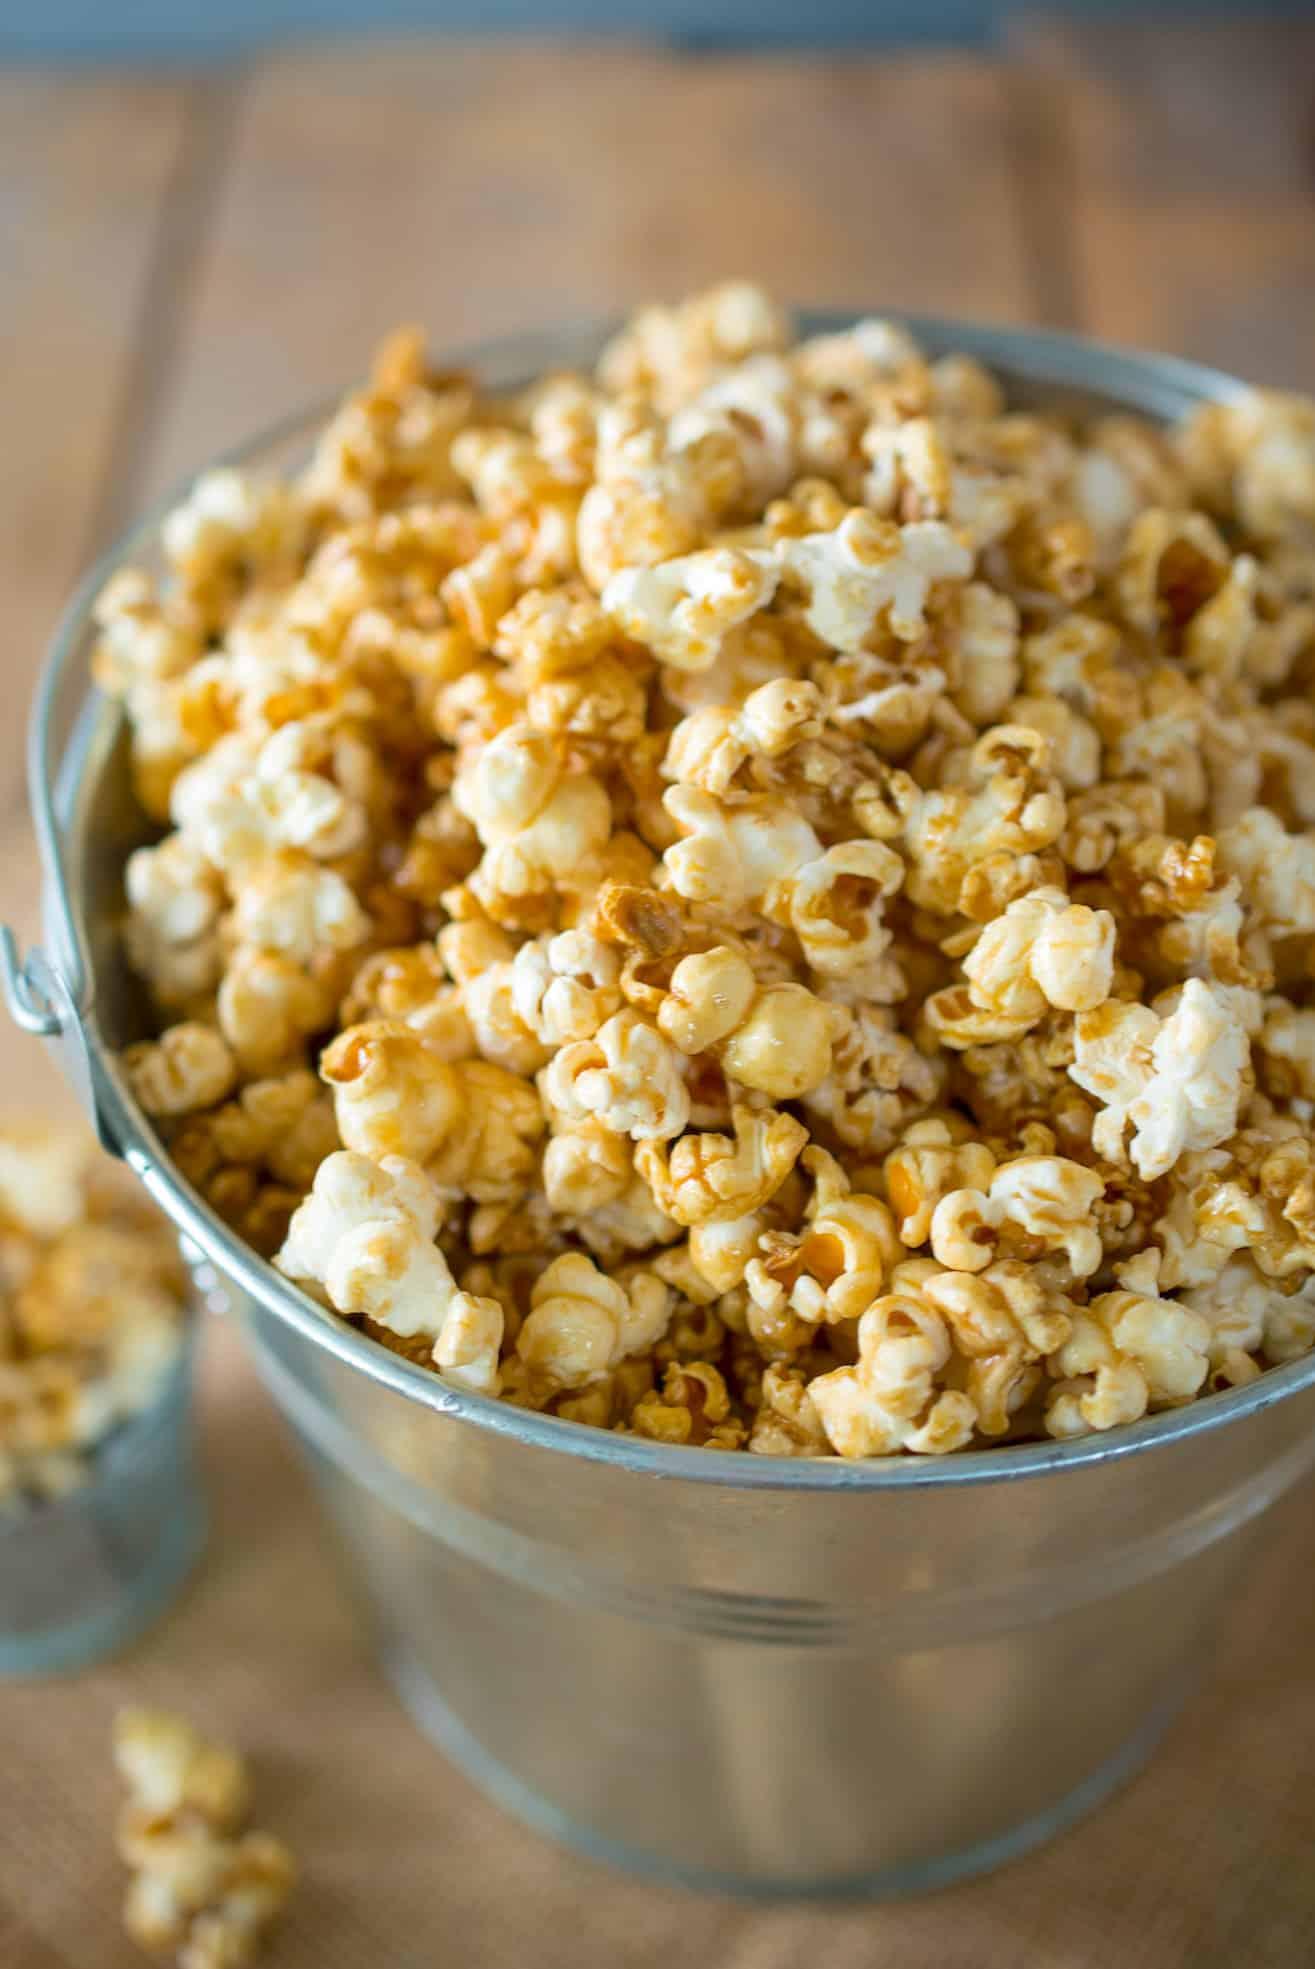 A closeup of Apple Cider Caramel Popcorn